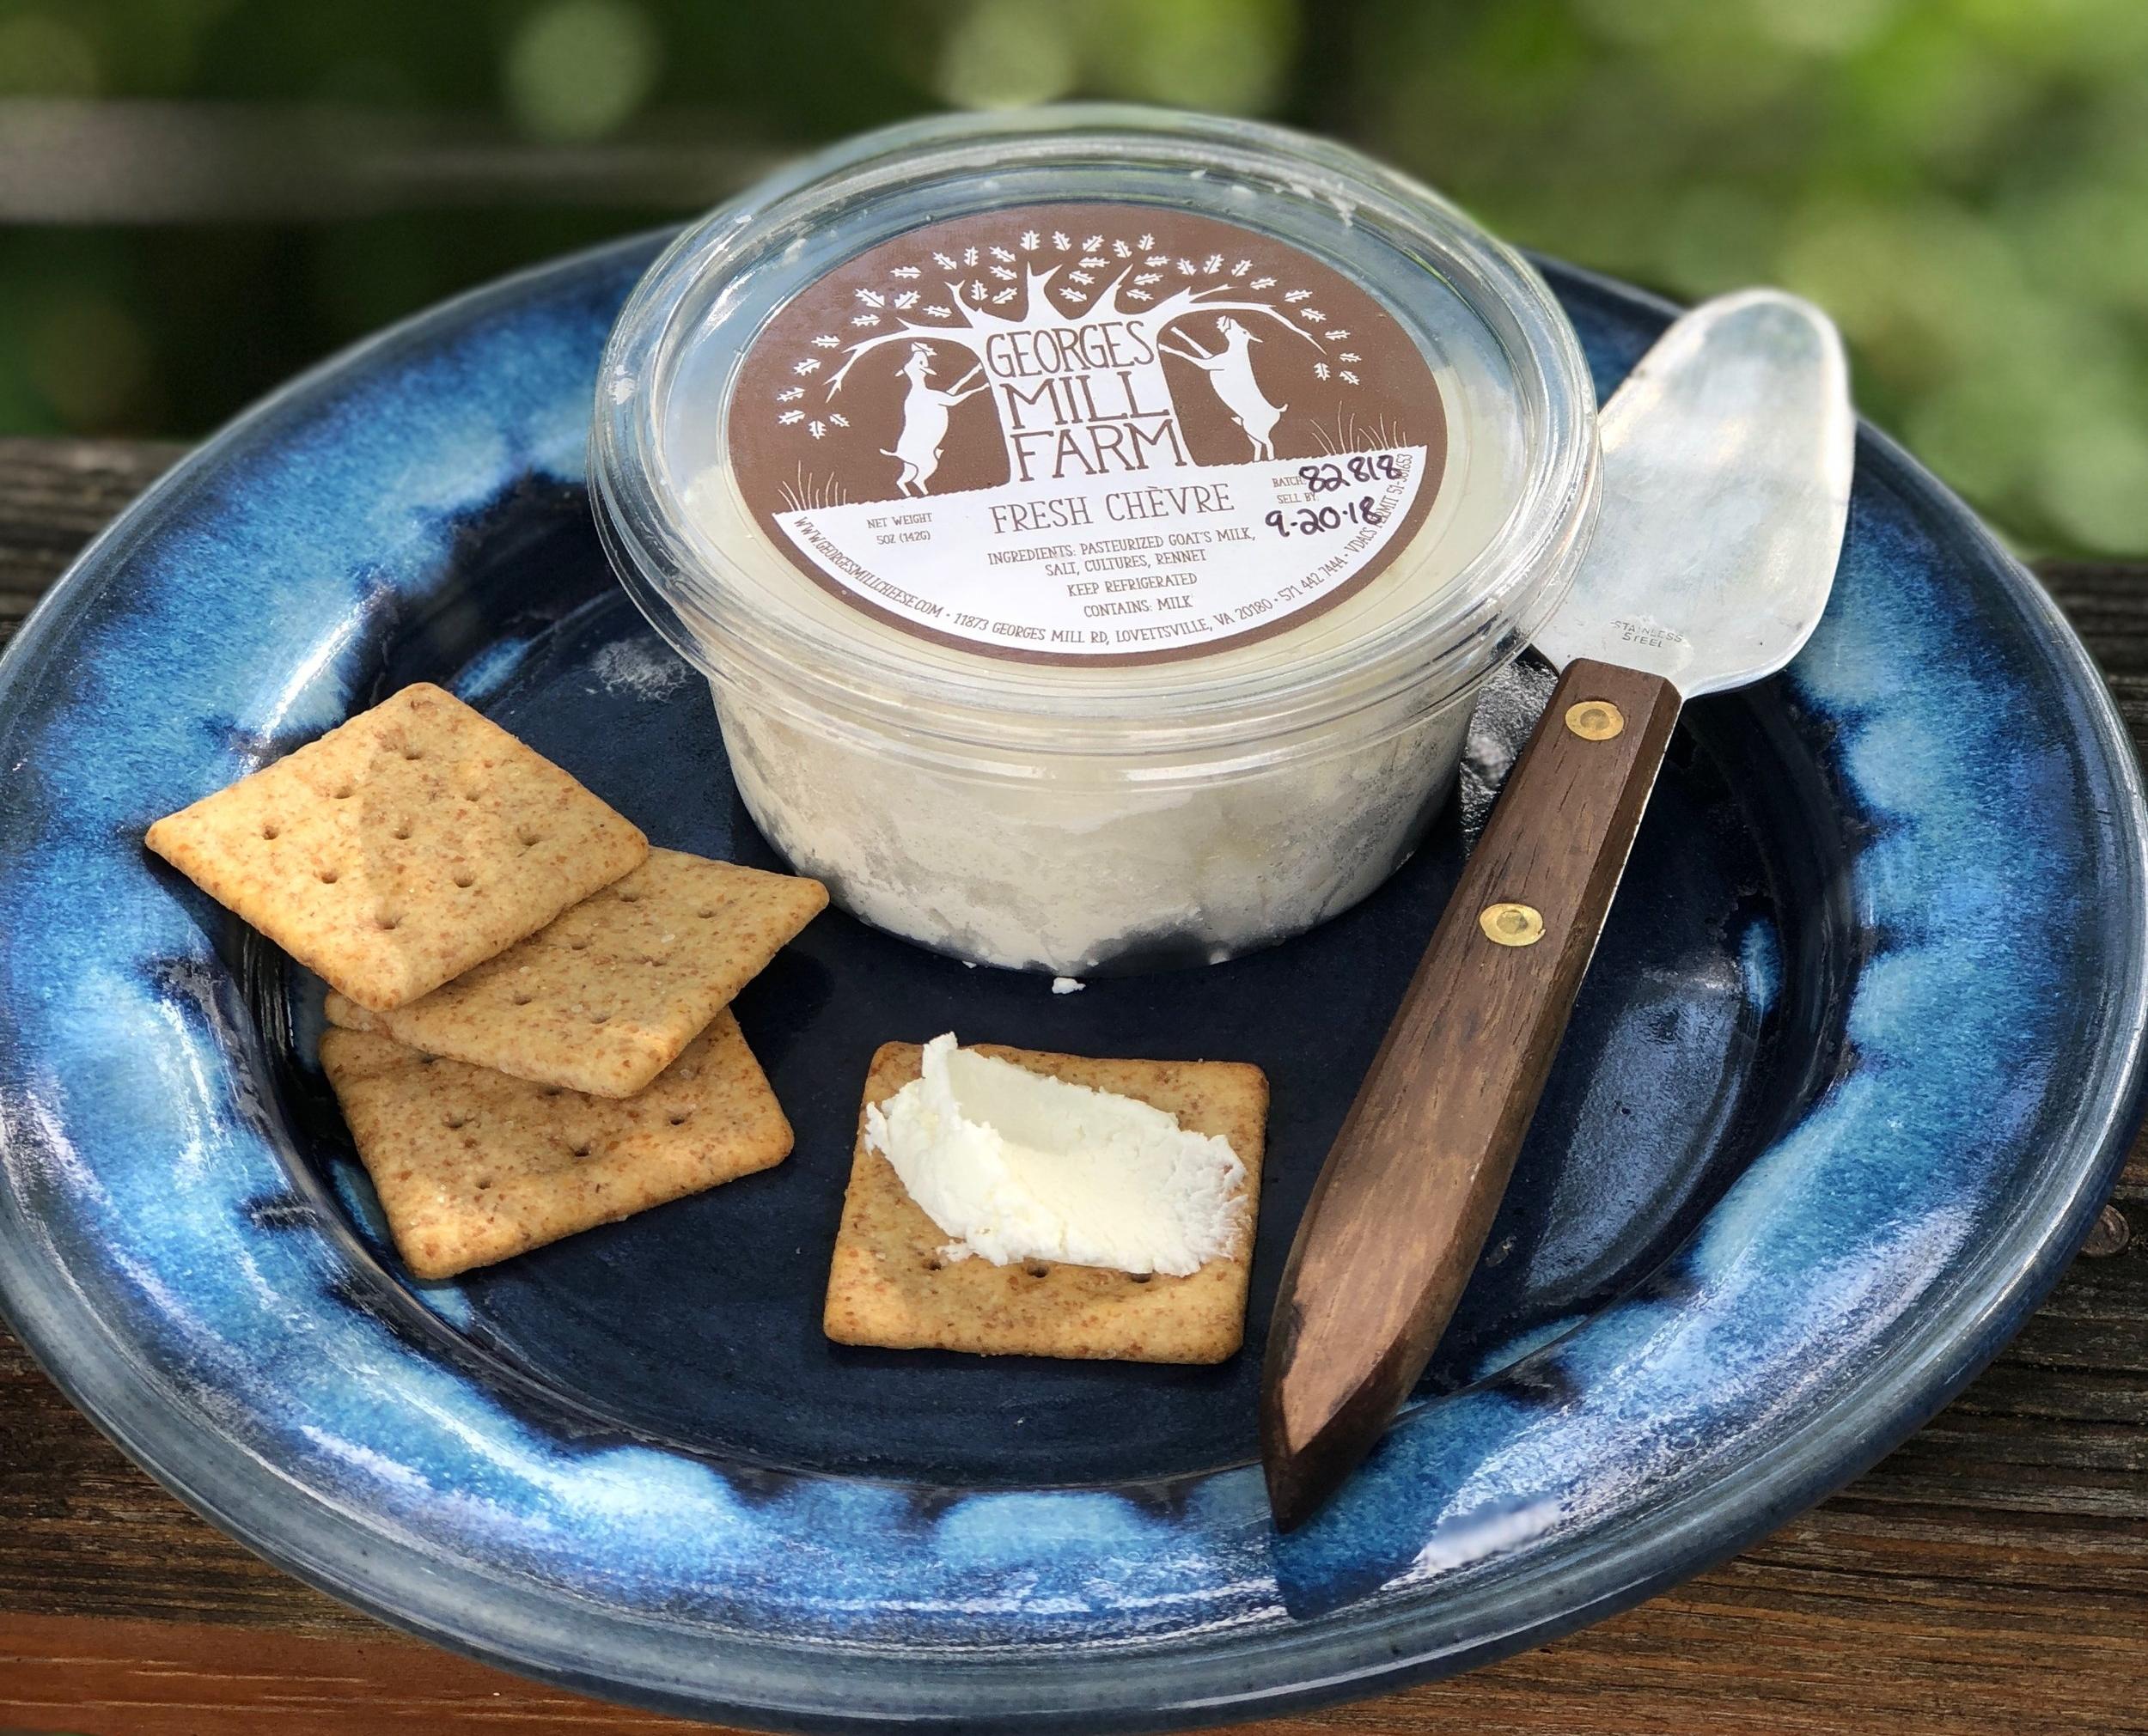 Fresh Chèvre , a creamy, tangy fresh cheese. Plain, honey, herb & garlic and rotating seasonal flavors   Available fresh March-Dec., frozen Jan.-Feb.